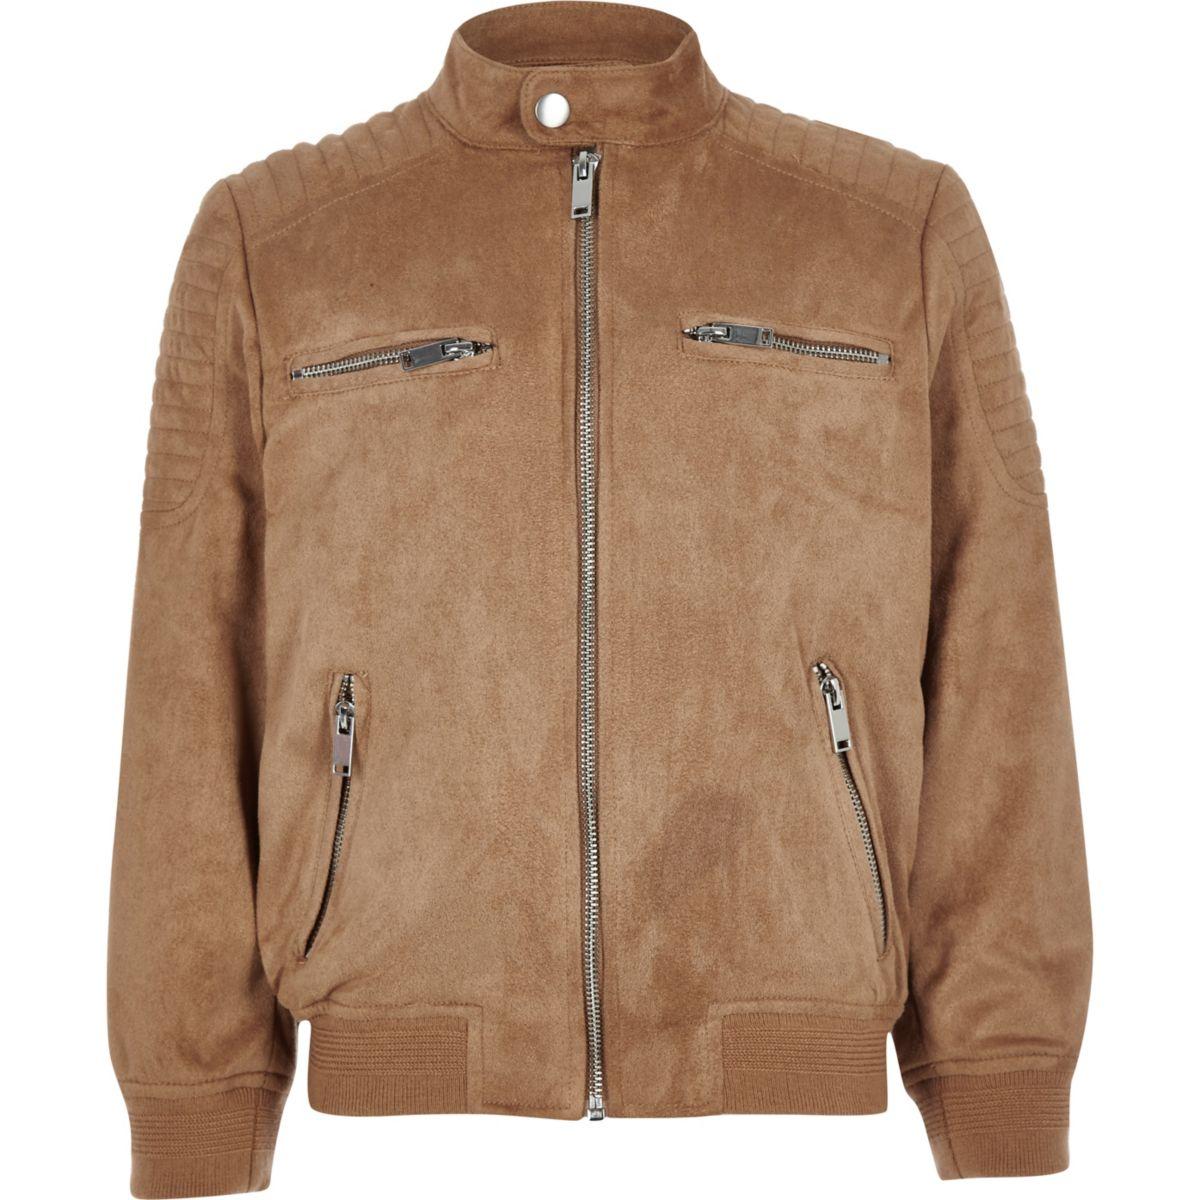 Boys brown faux suede racer neck jacket